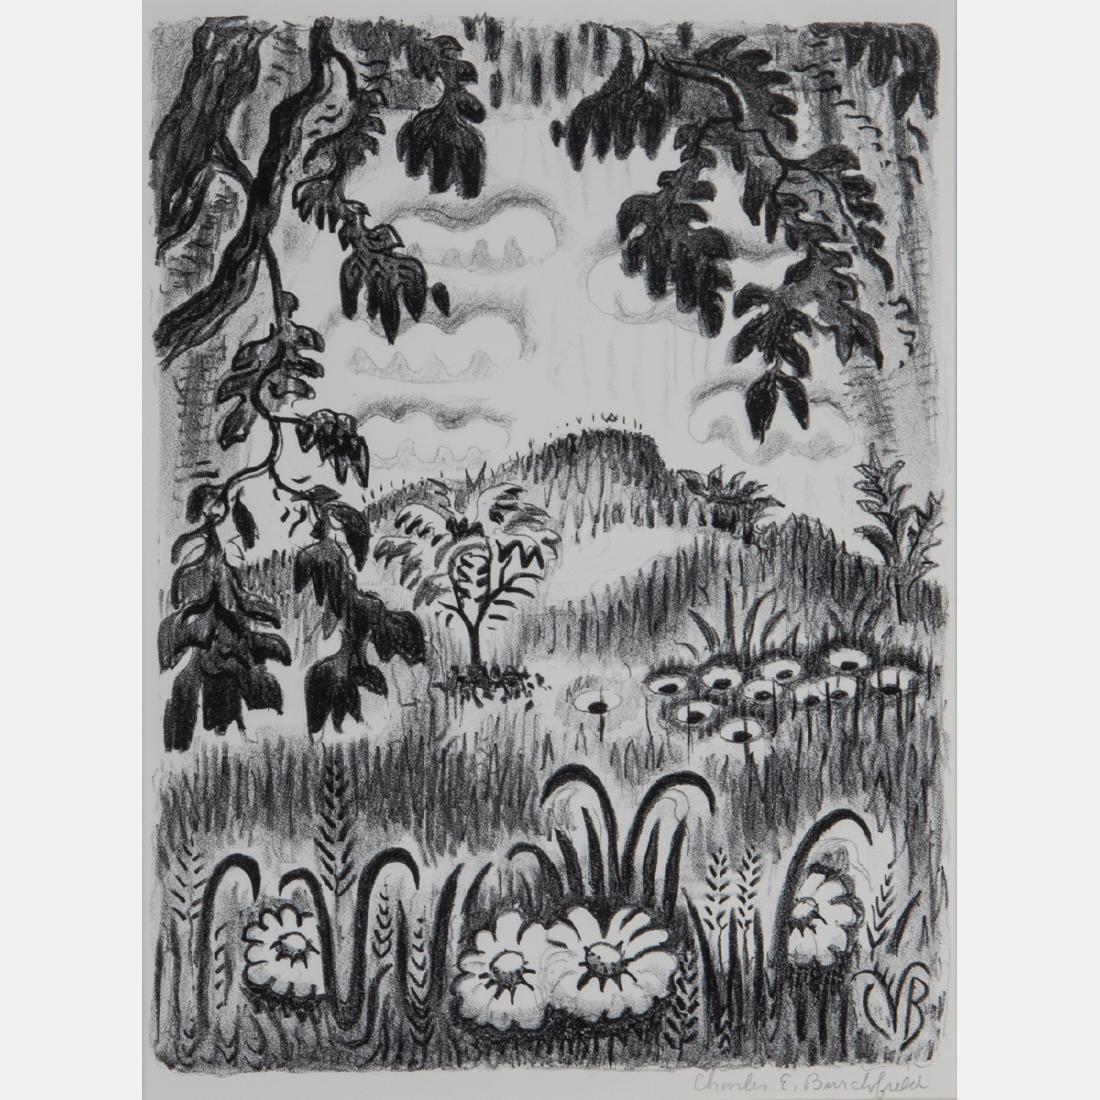 Charles Ephraim Burchfield (1893-1967) Summer